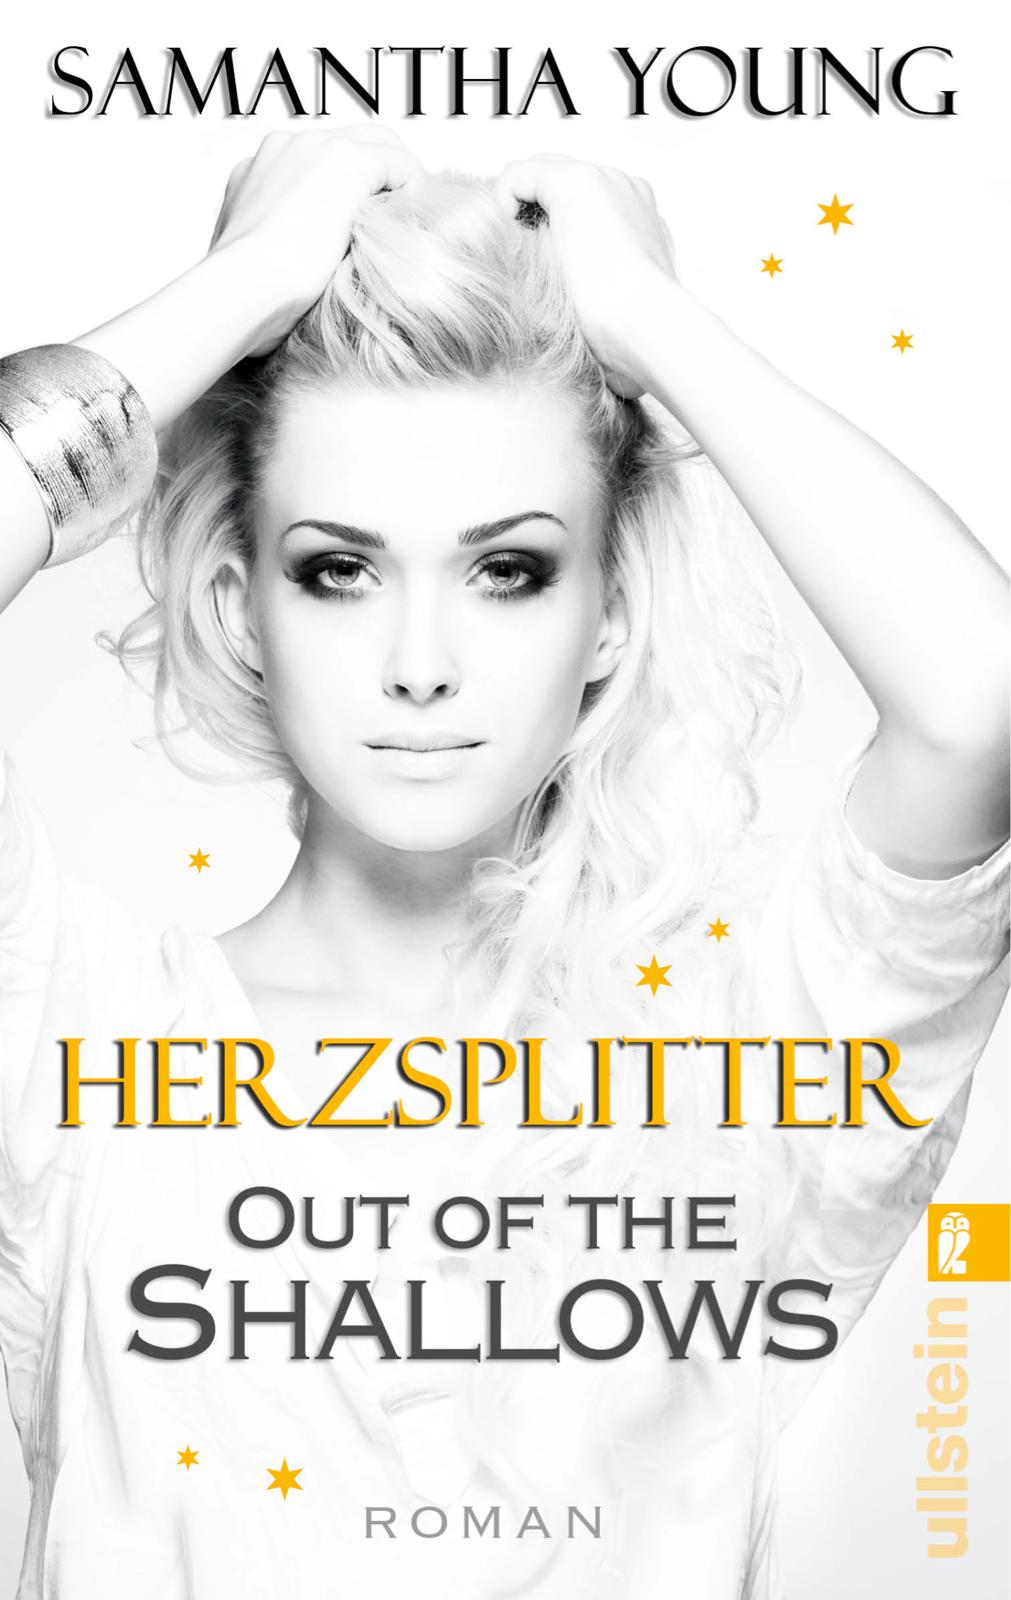 Out of the Shallows: Herzsplitter - Samantha Young [Taschenbuch]